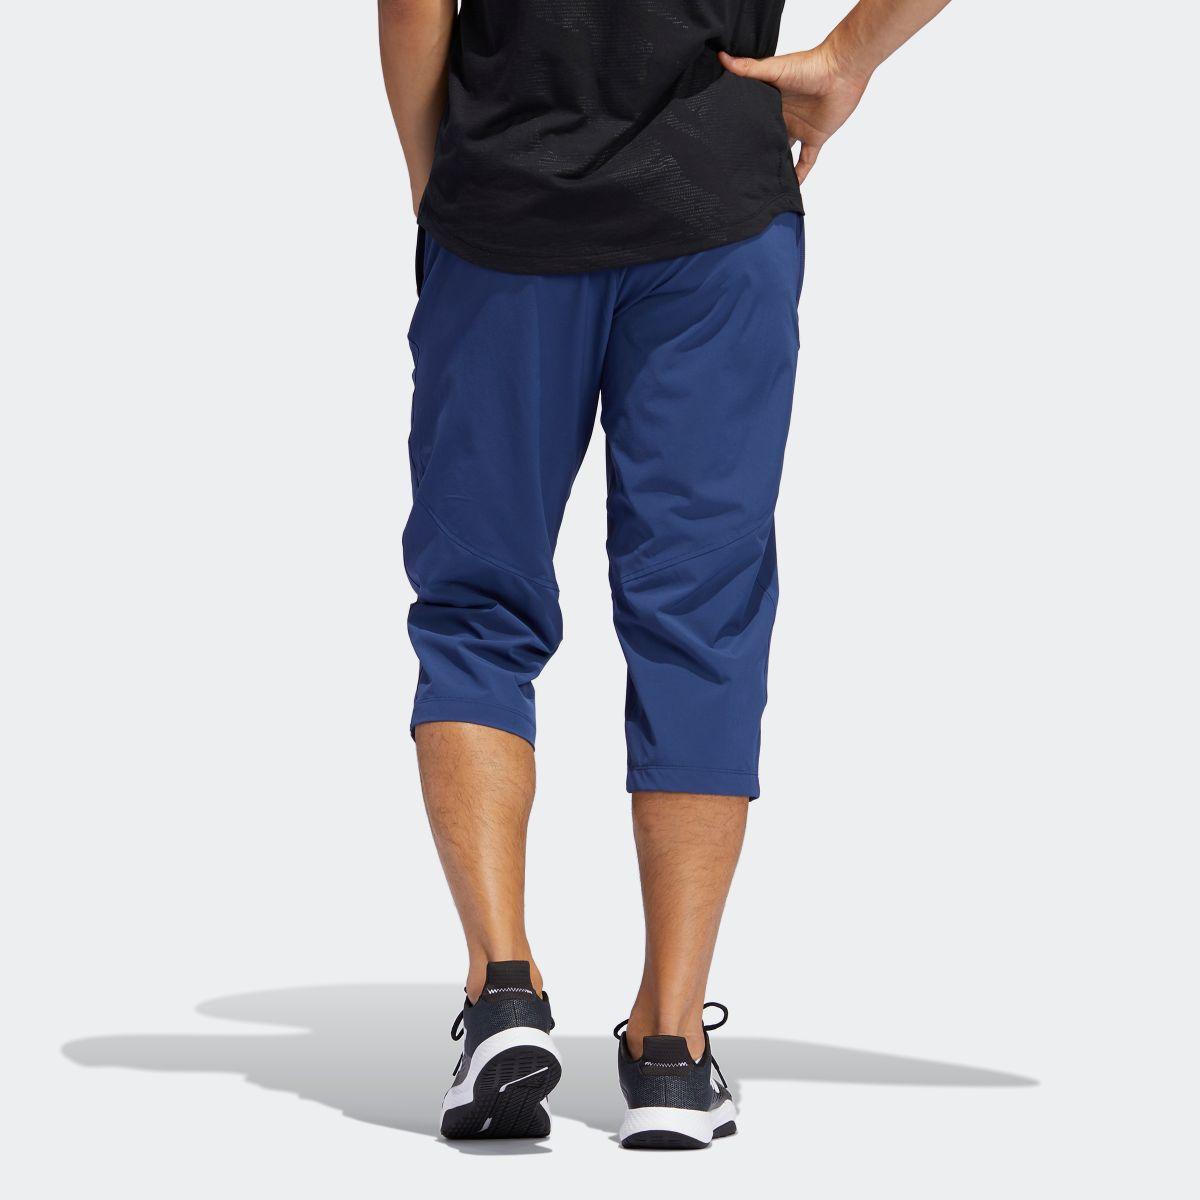 3 4 training pants adidas